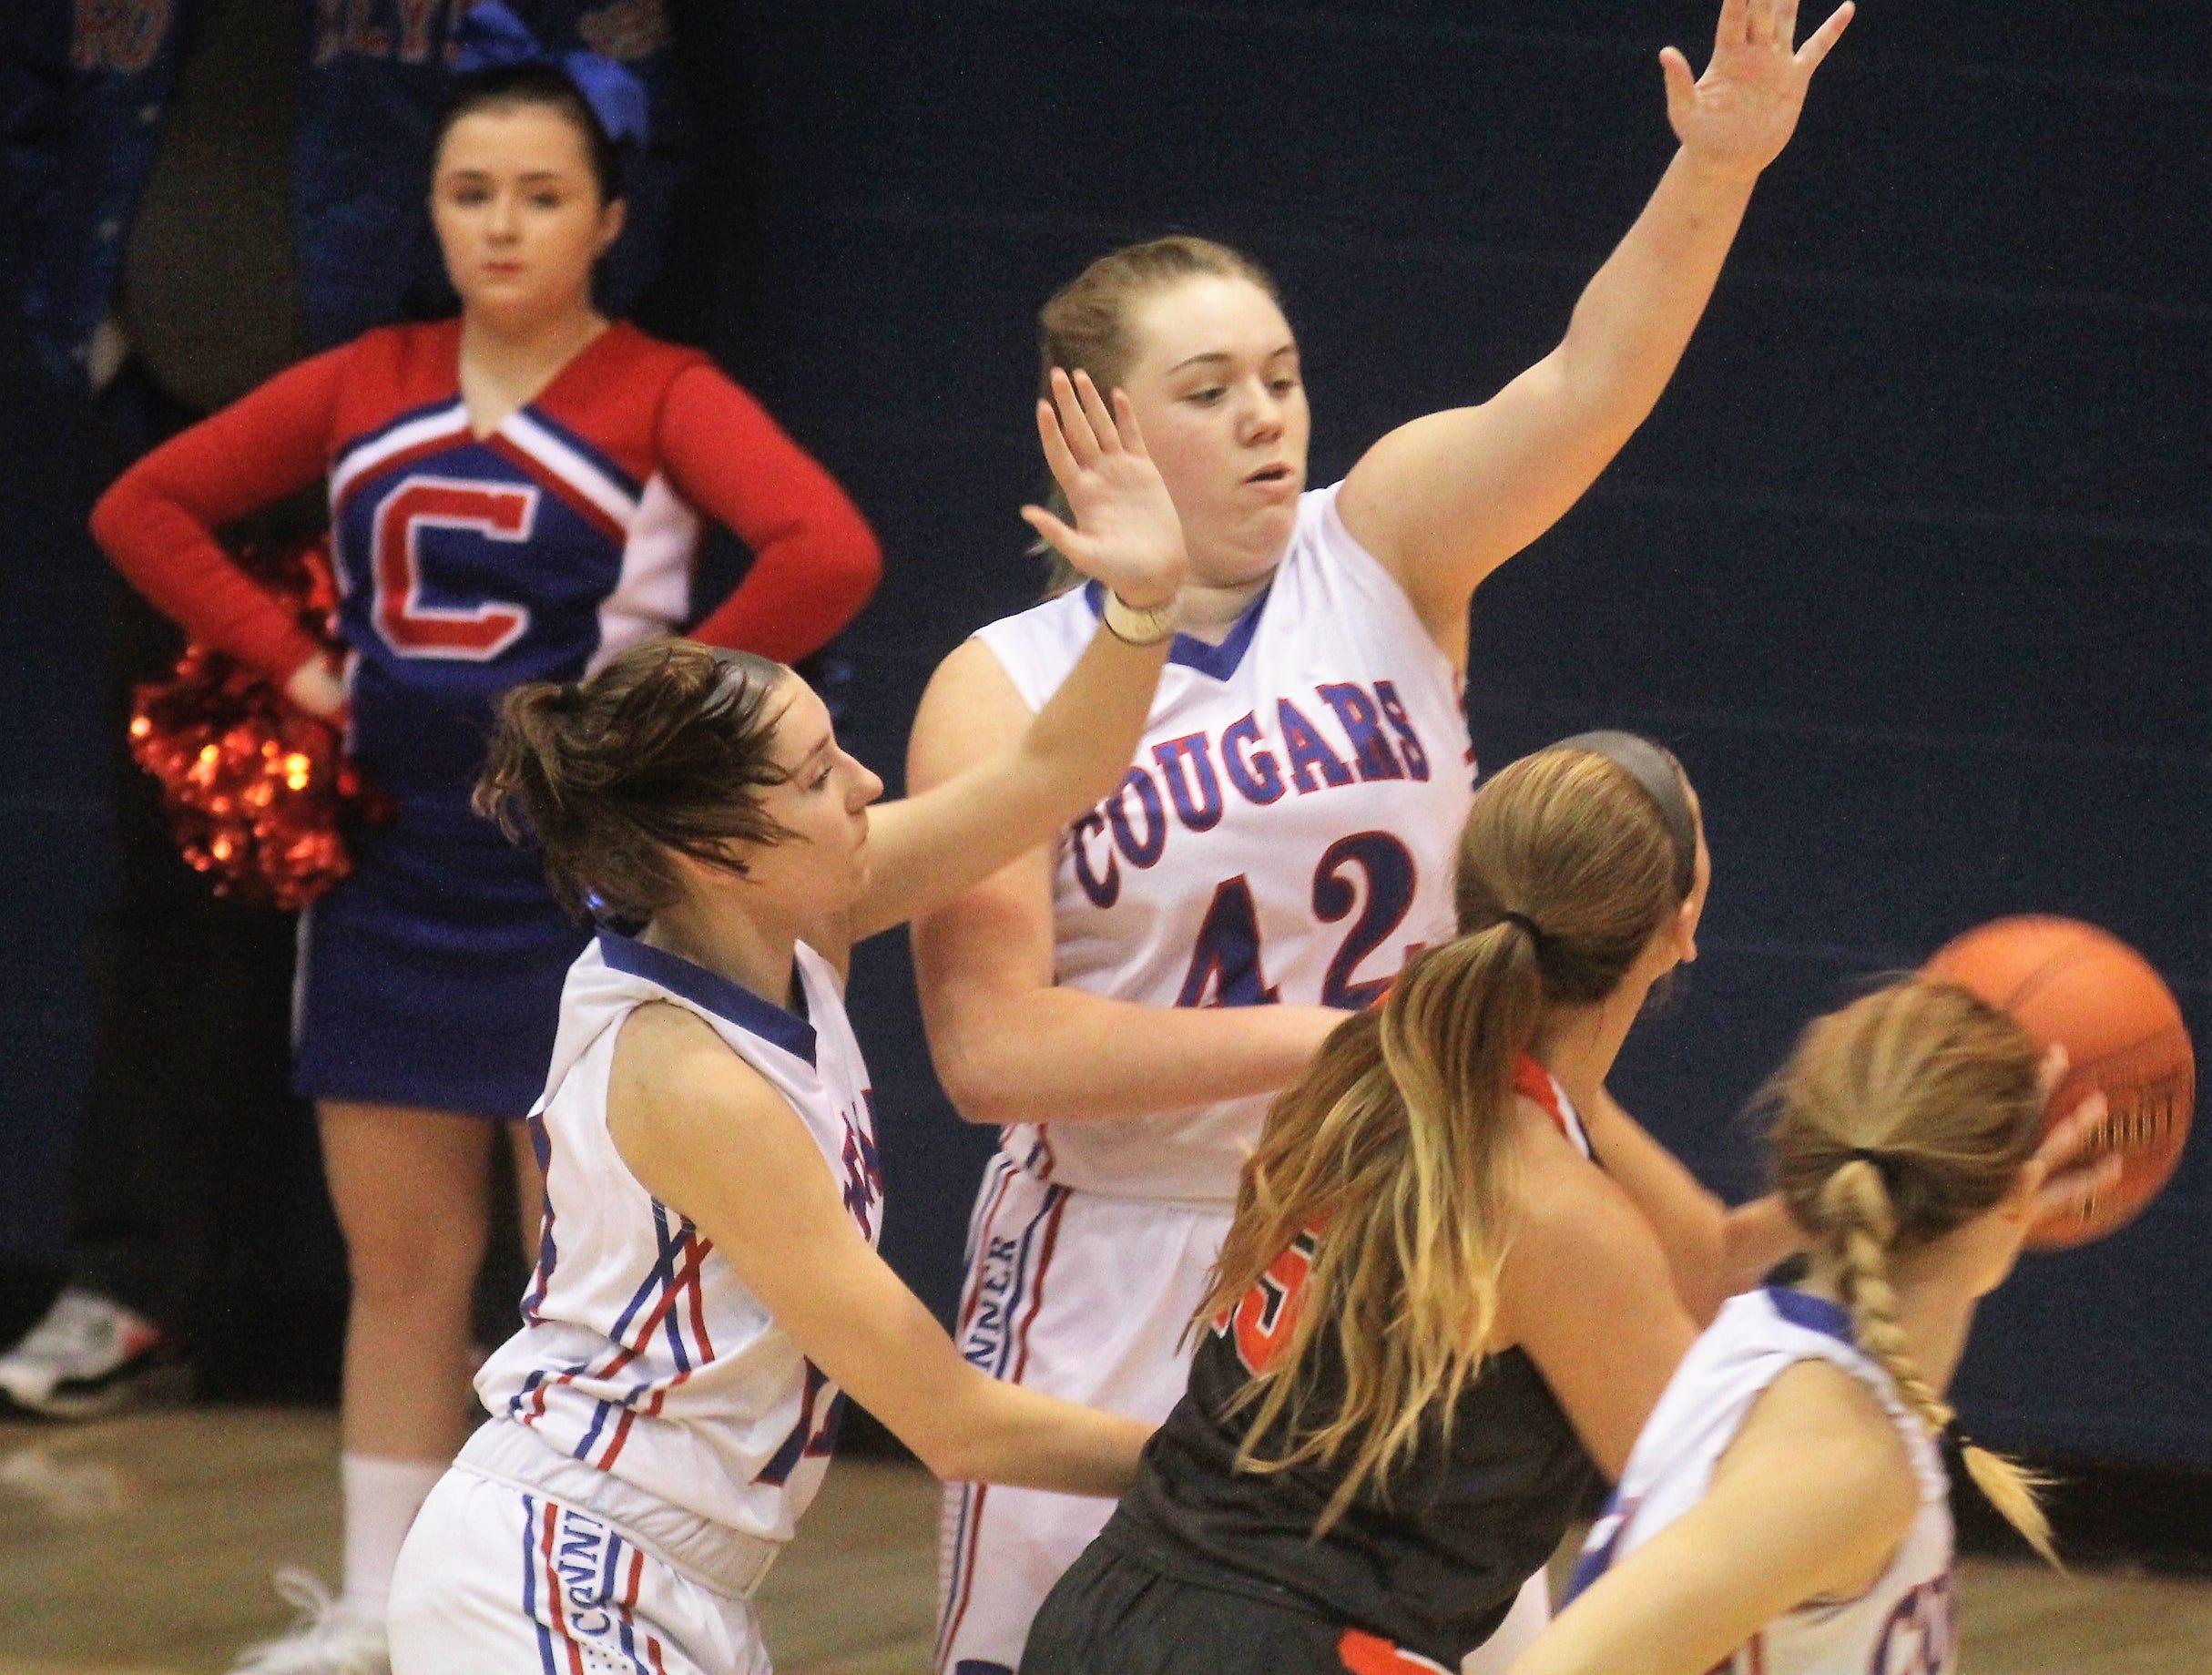 Conner junior Maddie Drummonds defends Ryle senior Lauren Schwartz as Ryle defeated Conner 60-49 in a girls basketball district game Dec. 7, 2018 at Conner High School, Hebron KY.